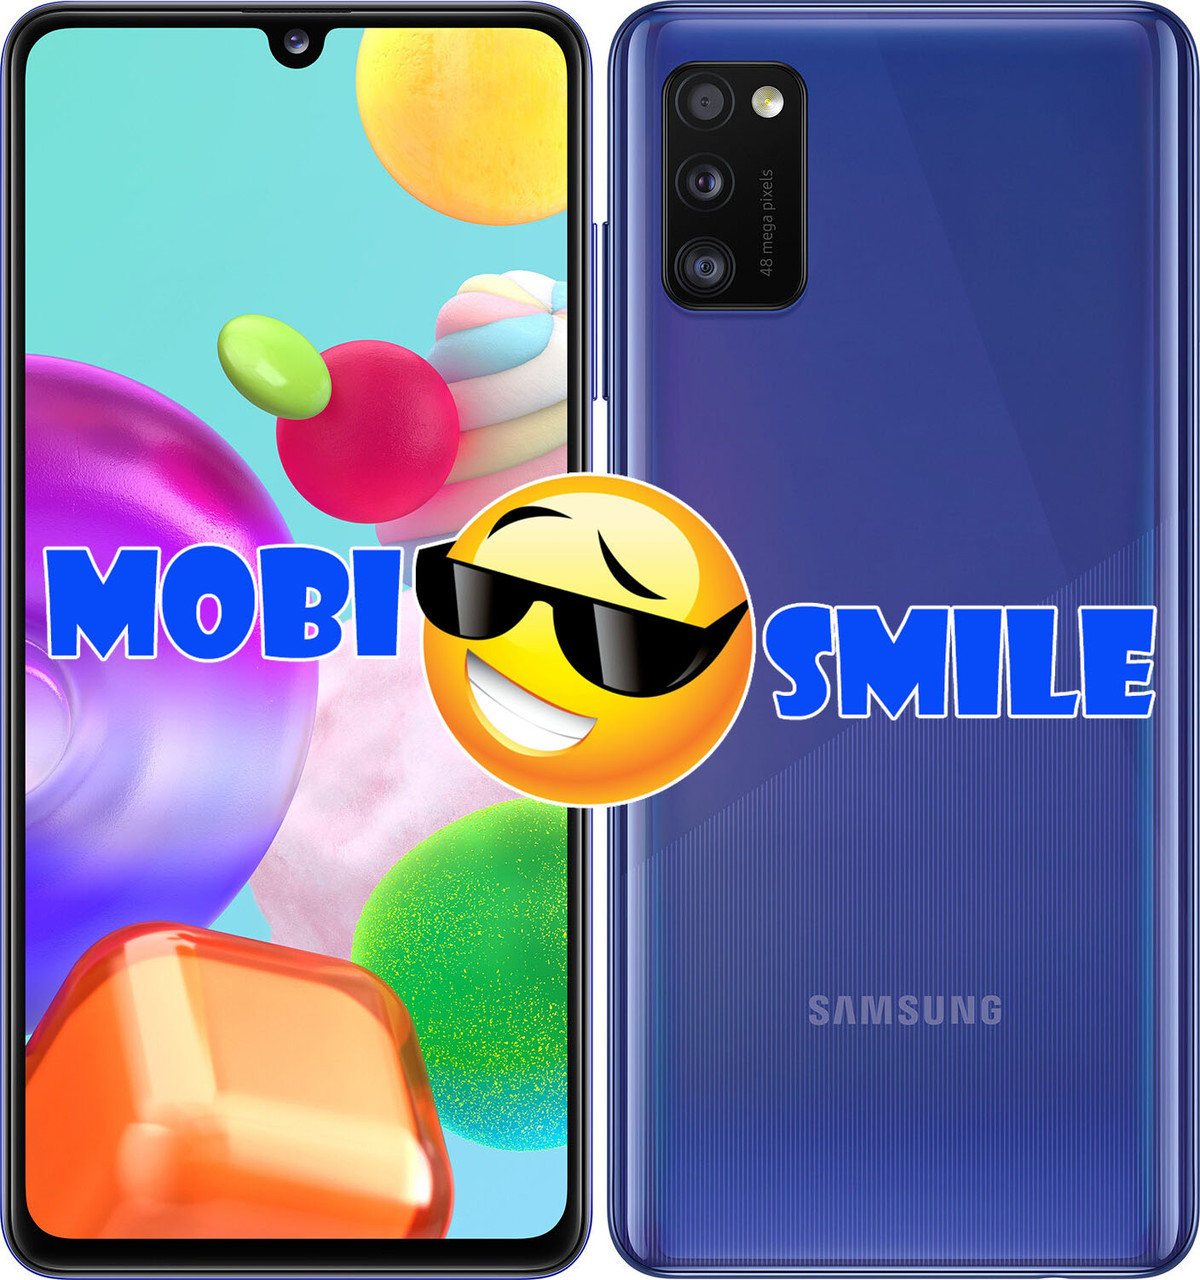 Смартфон Samsung Galaxy A41 4/64GB Blue (SM-A415FZBDSEK) ОРИГИНАЛ Гарантия 12 месяцев